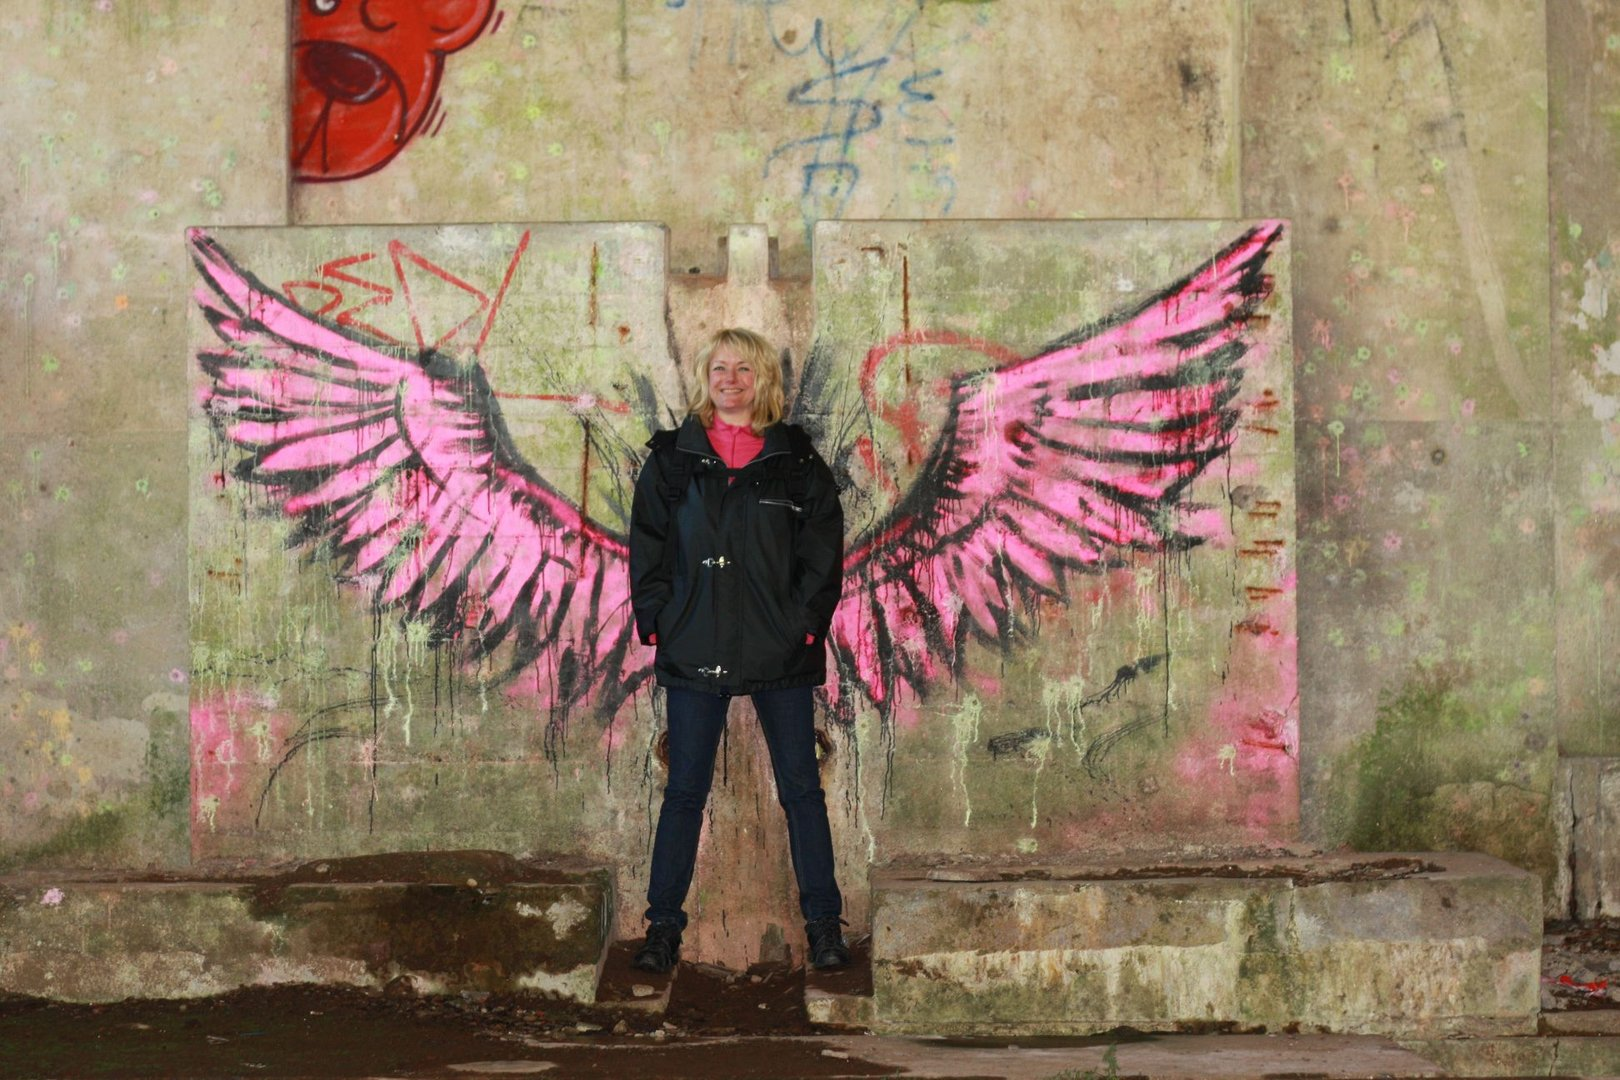 Engel können fliegen